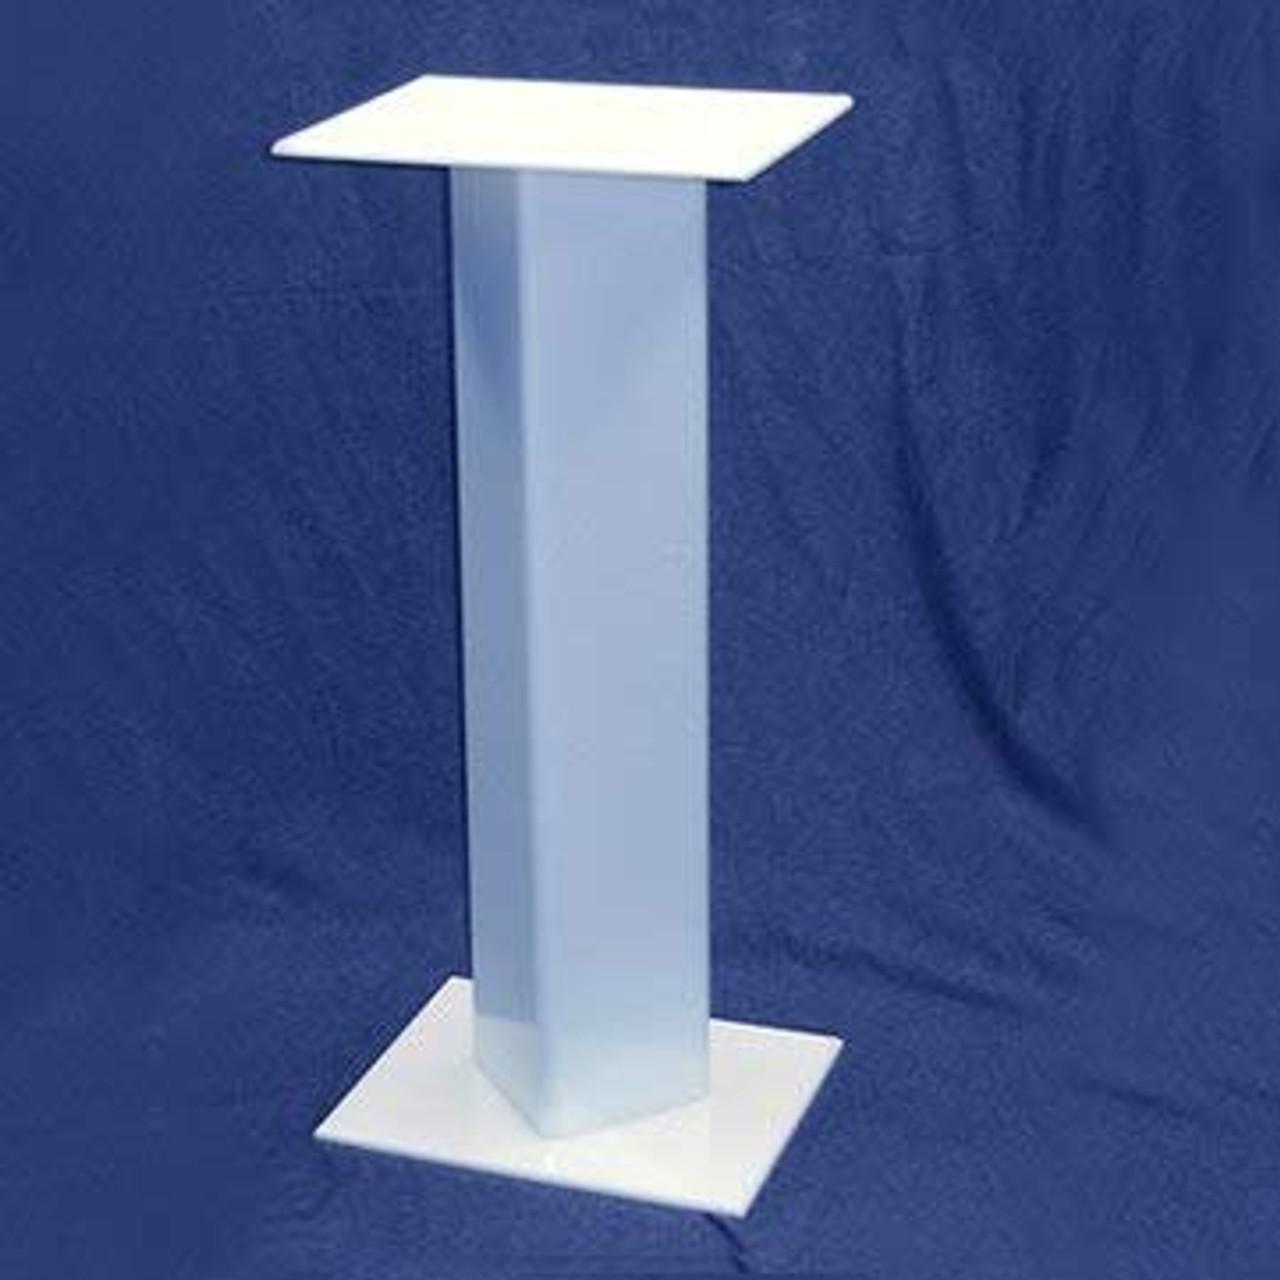 Square Acrylic Pedestal, 24 inch, White